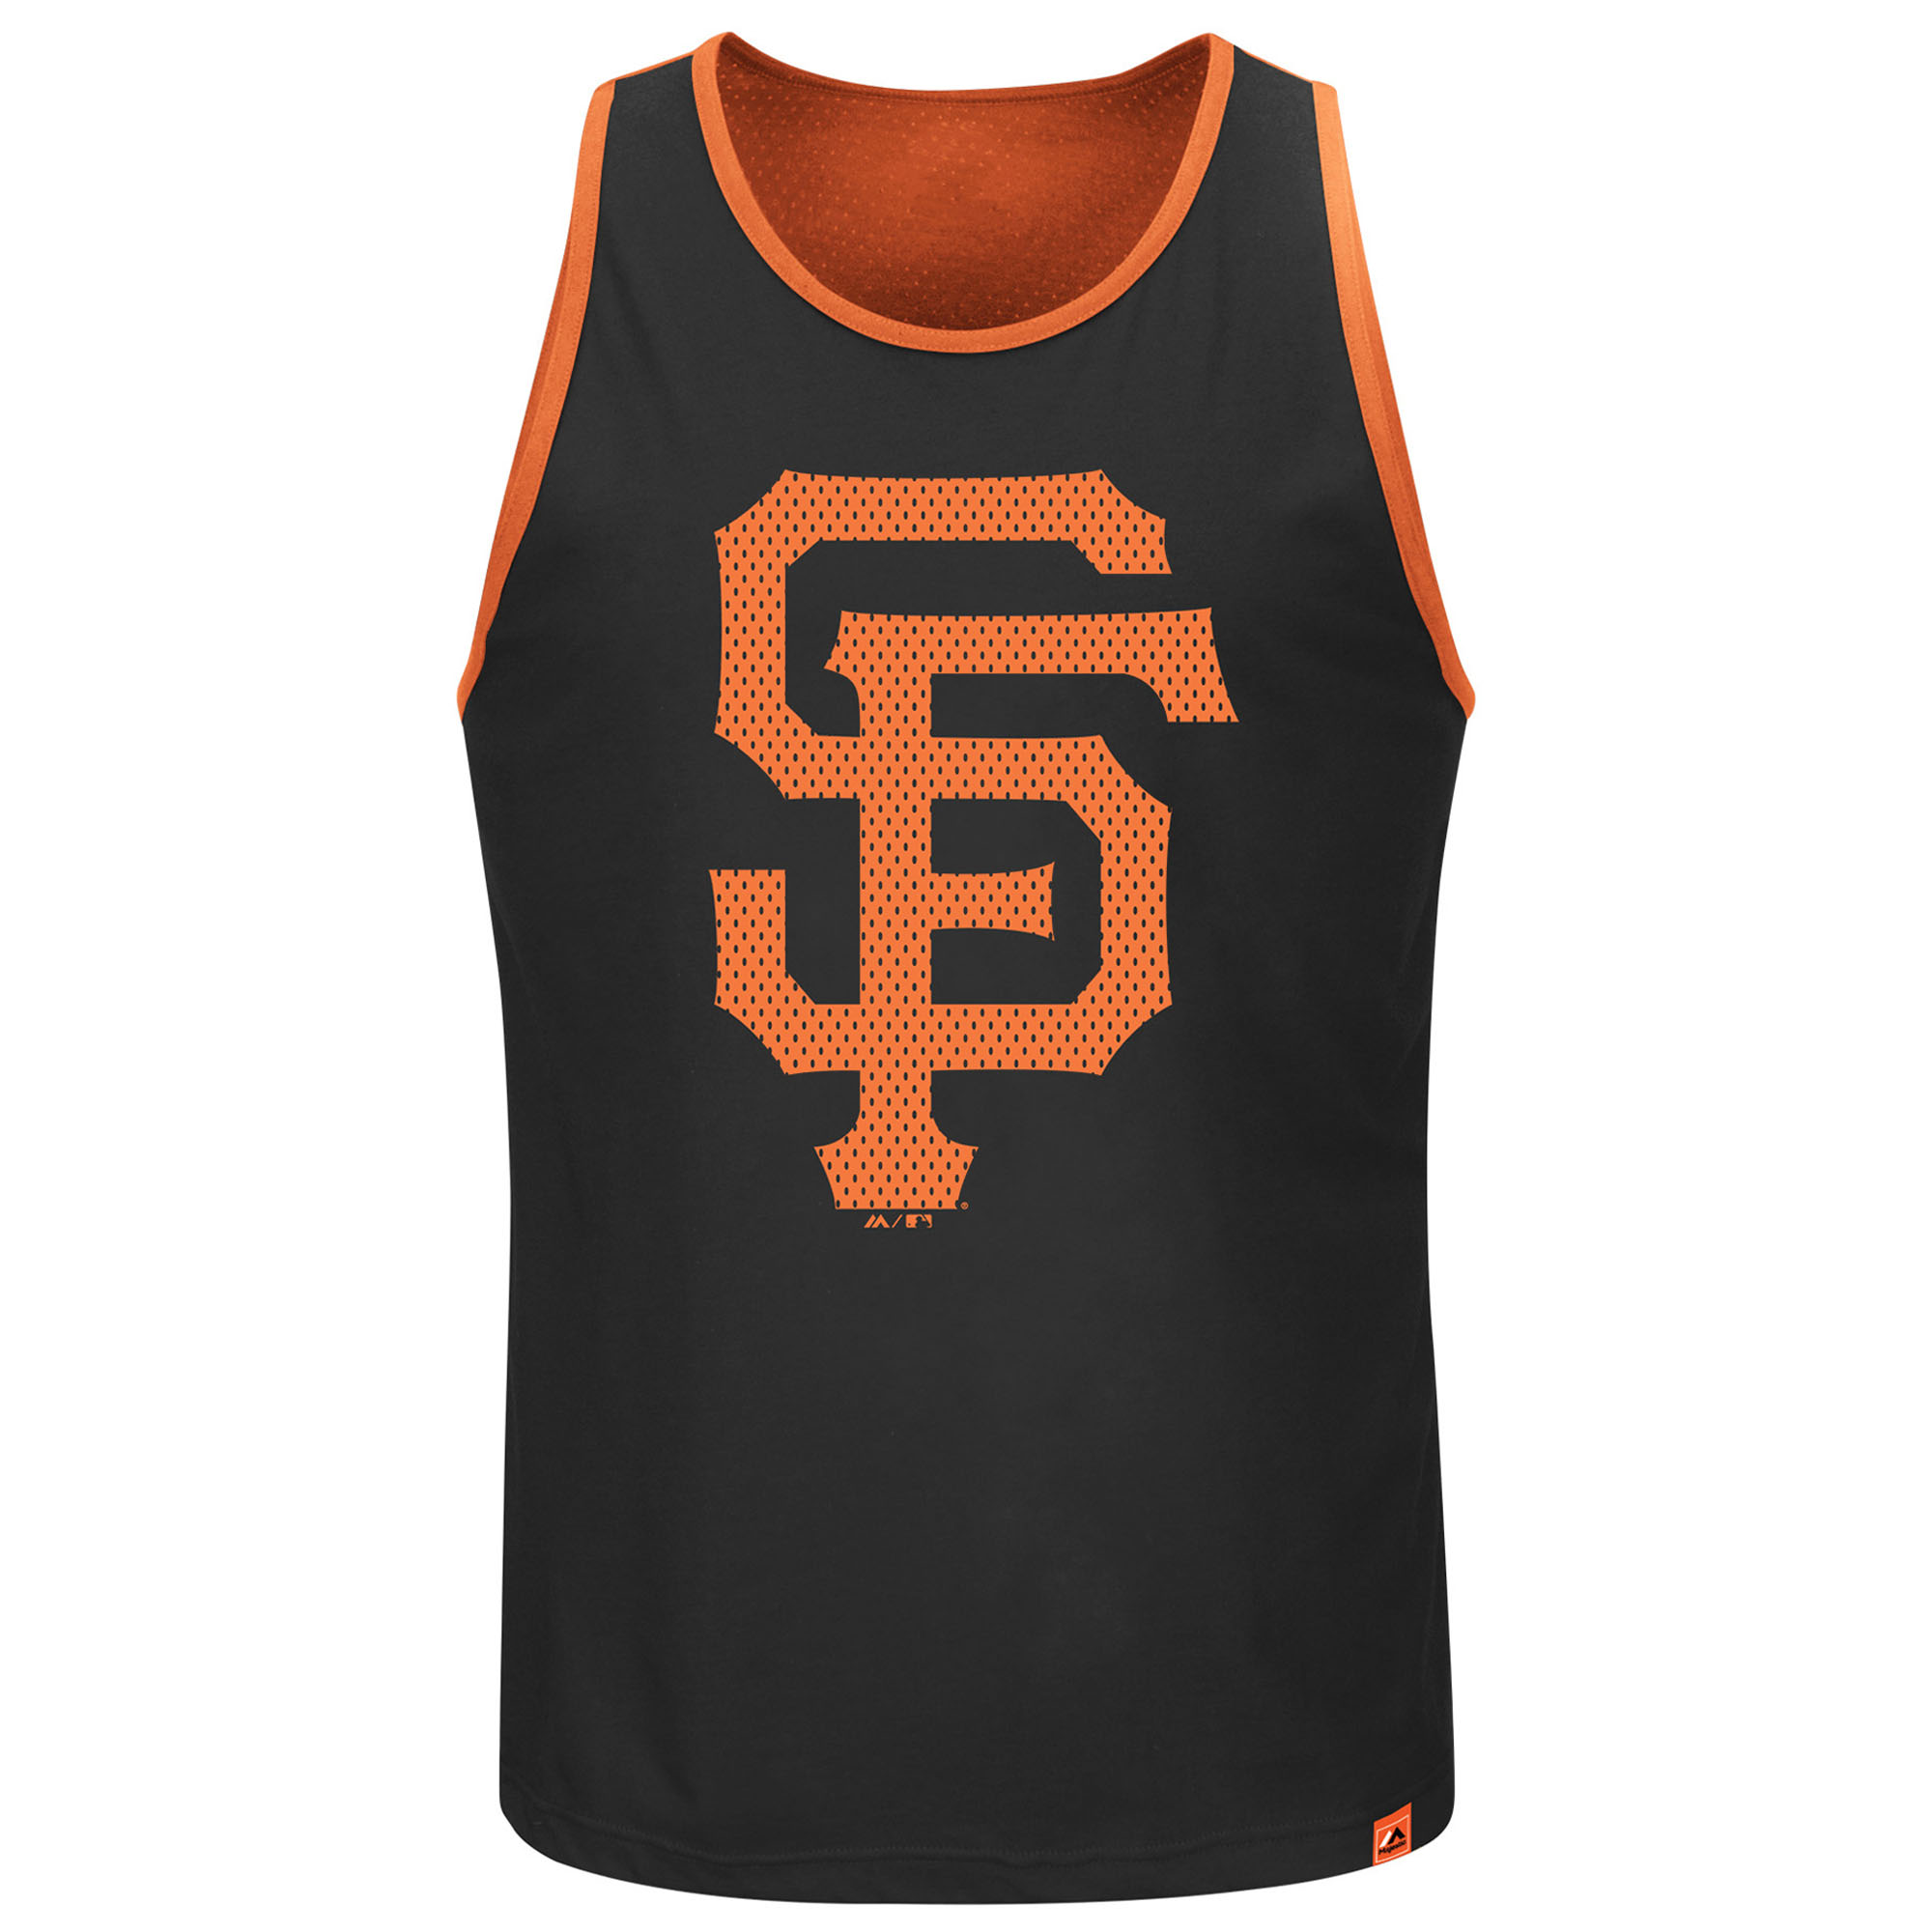 San Francisco Giants Majestic All Last Season Tank Top - Black